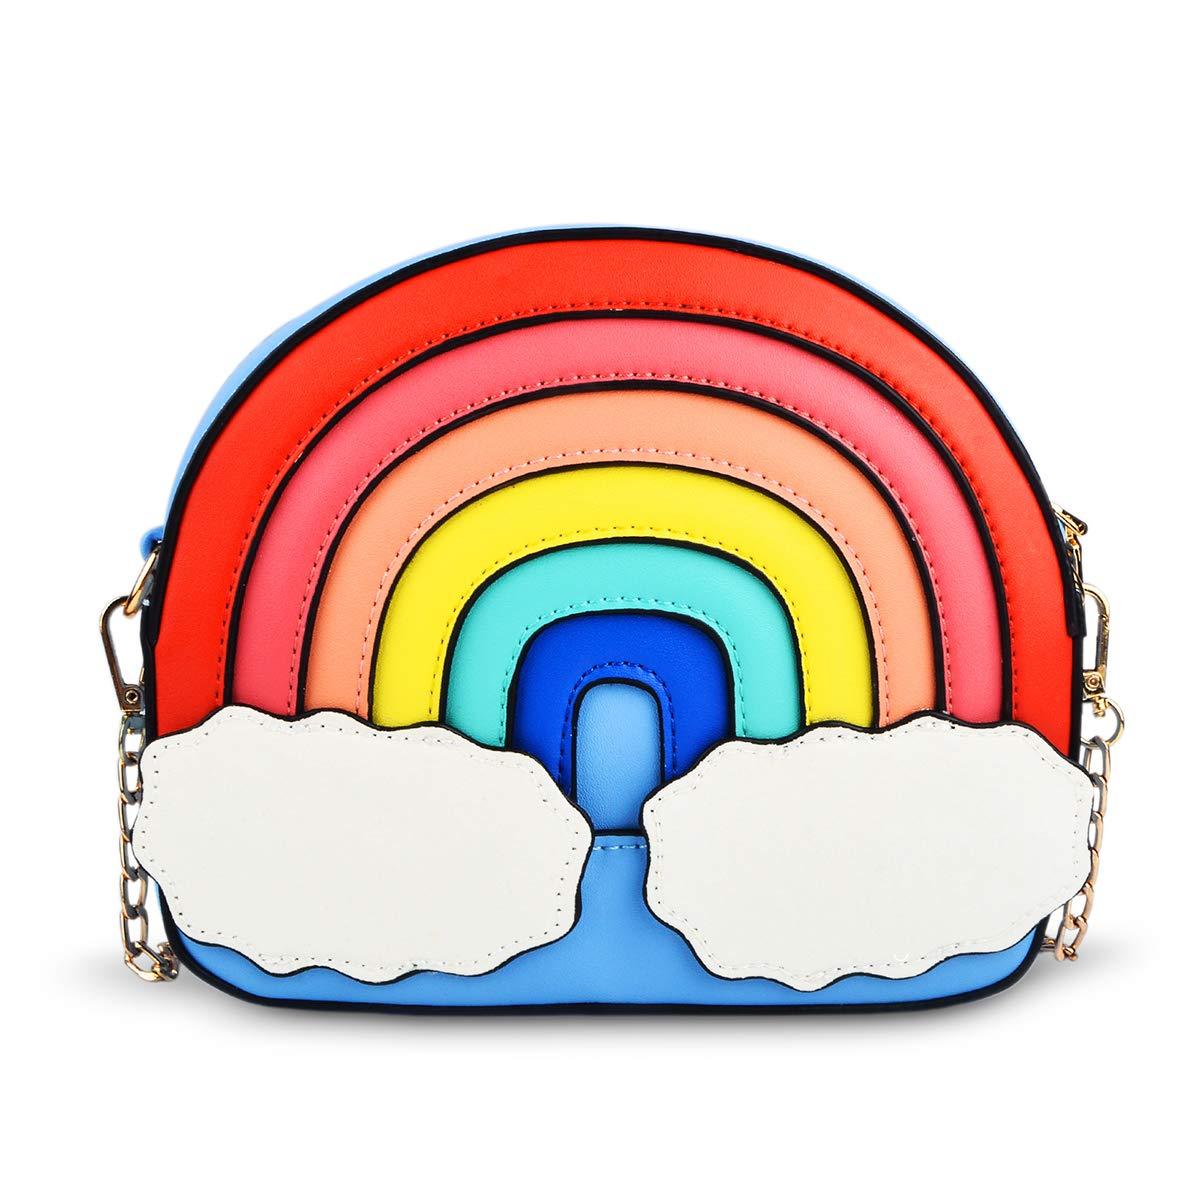 ویکالا · خرید  اصل اورجینال · خرید از آمازون · Rainbow Shape Crossbody Bag, Ustyle Women Girl Cute Shopping Shoulder Bag Removable Chain Strap (blue) wekala · ویکالا